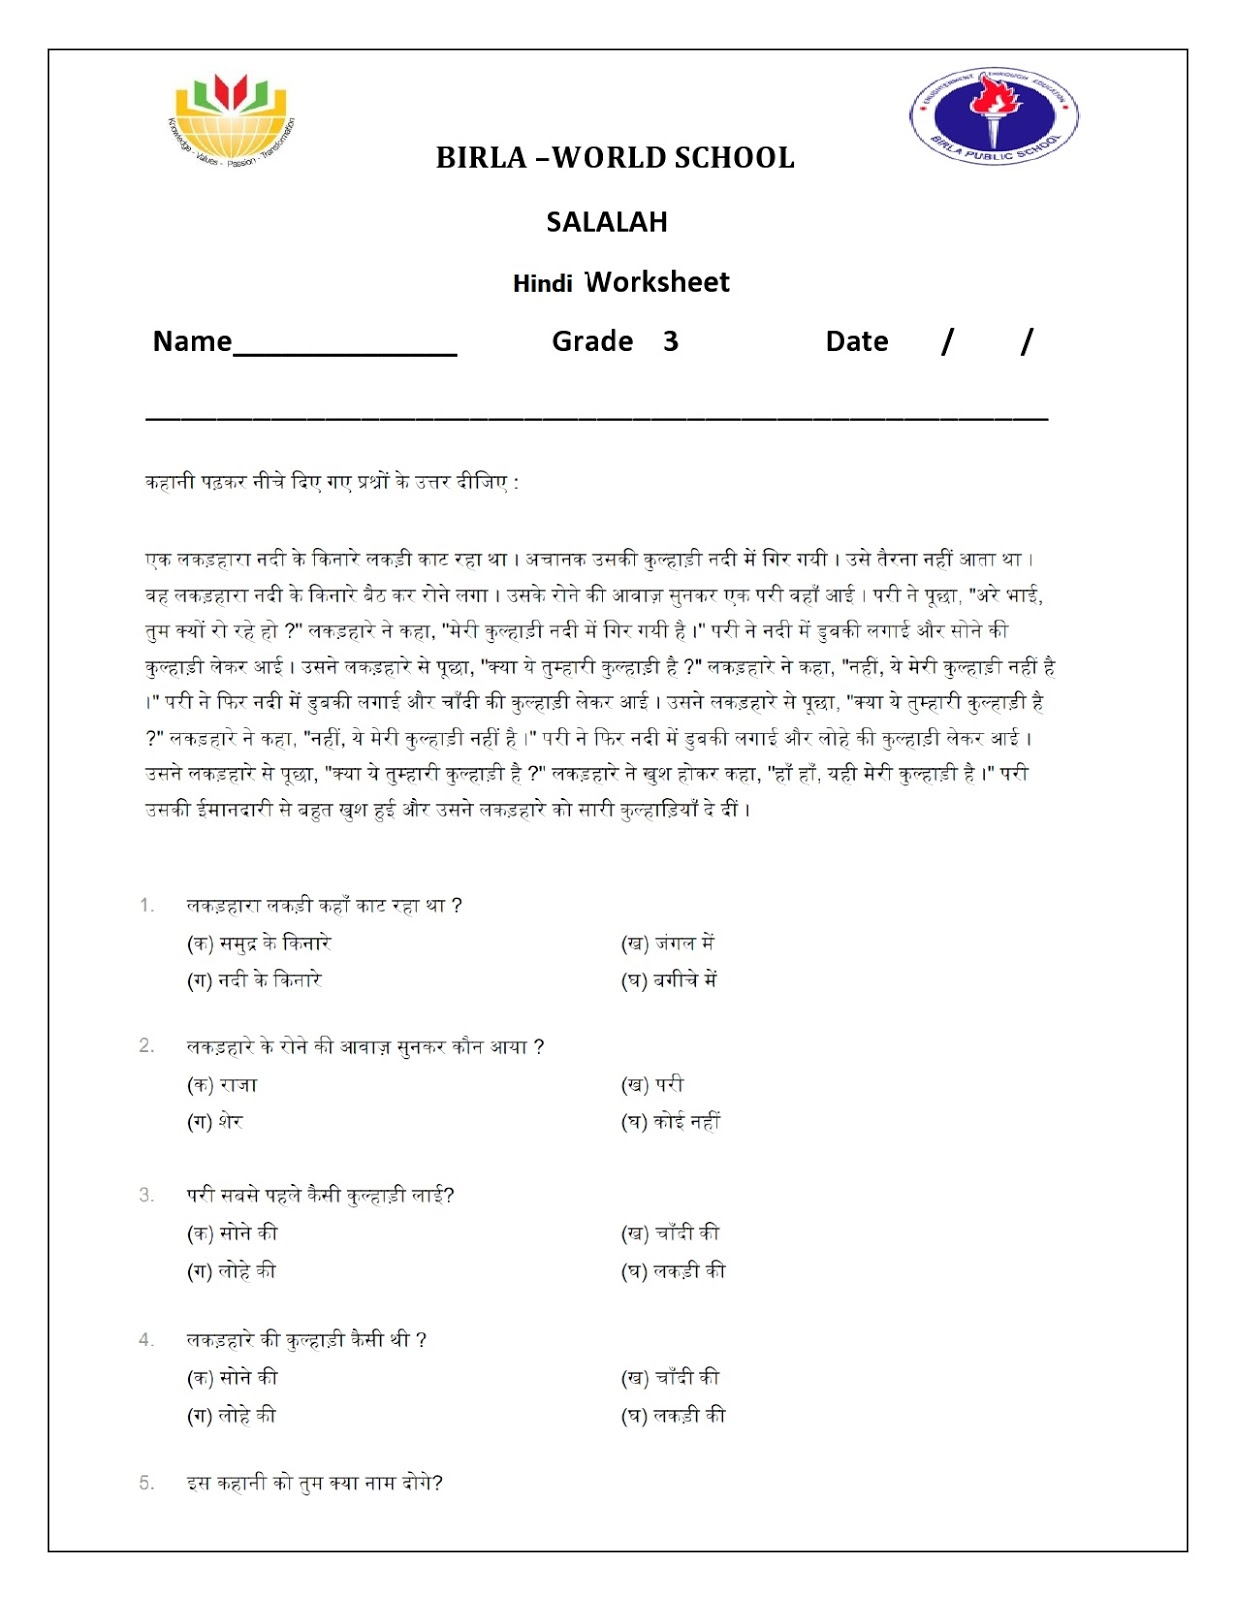 Birla World School Oman Homework For Grade 3b On 25 1 16